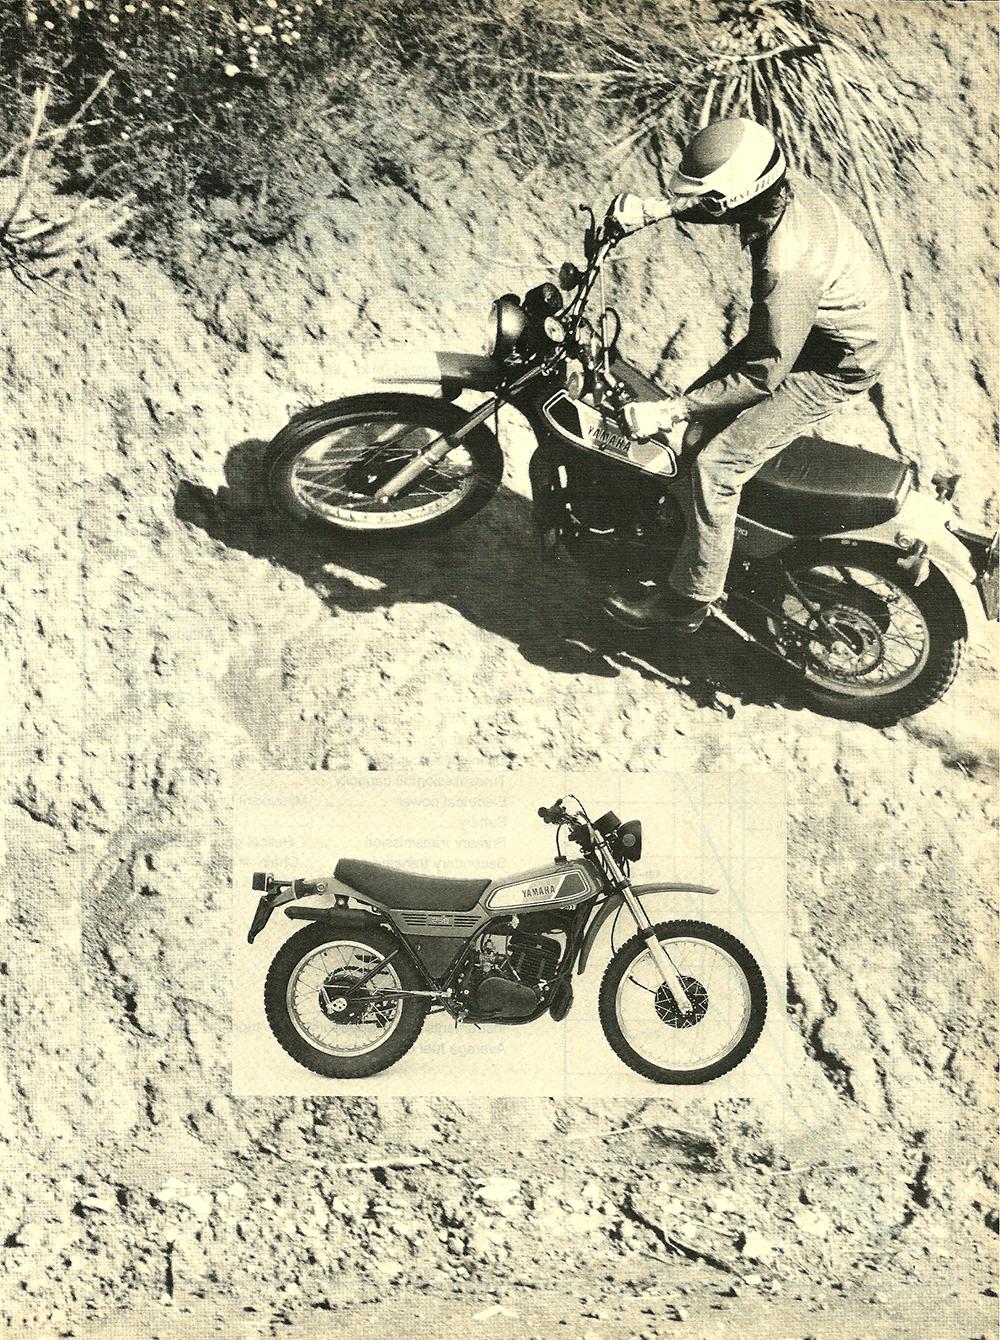 1977 Yamaha DT250D road test 3.jpg